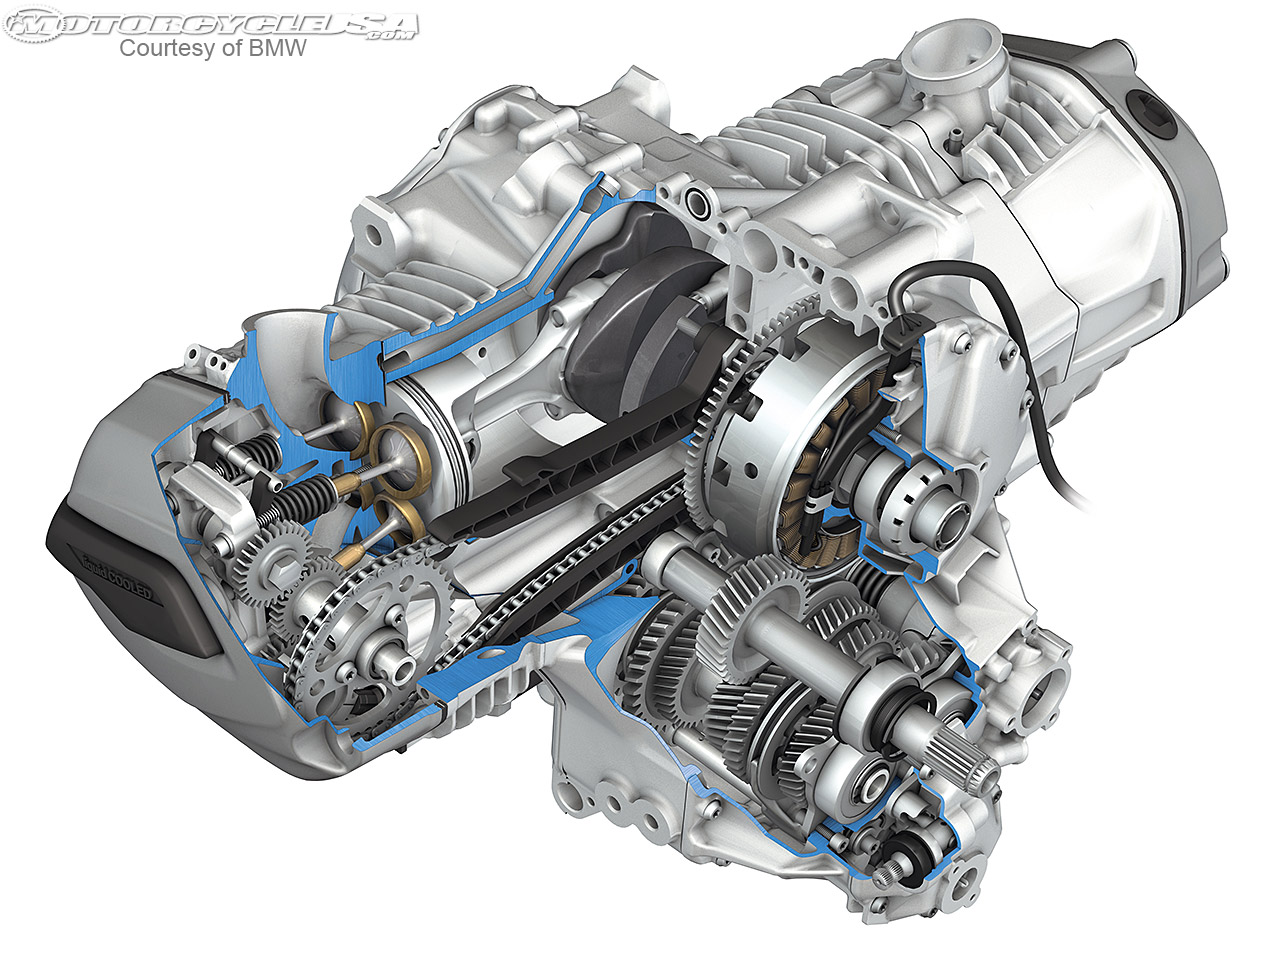 Bmw R1200gslcと共に 水平対向エンジン